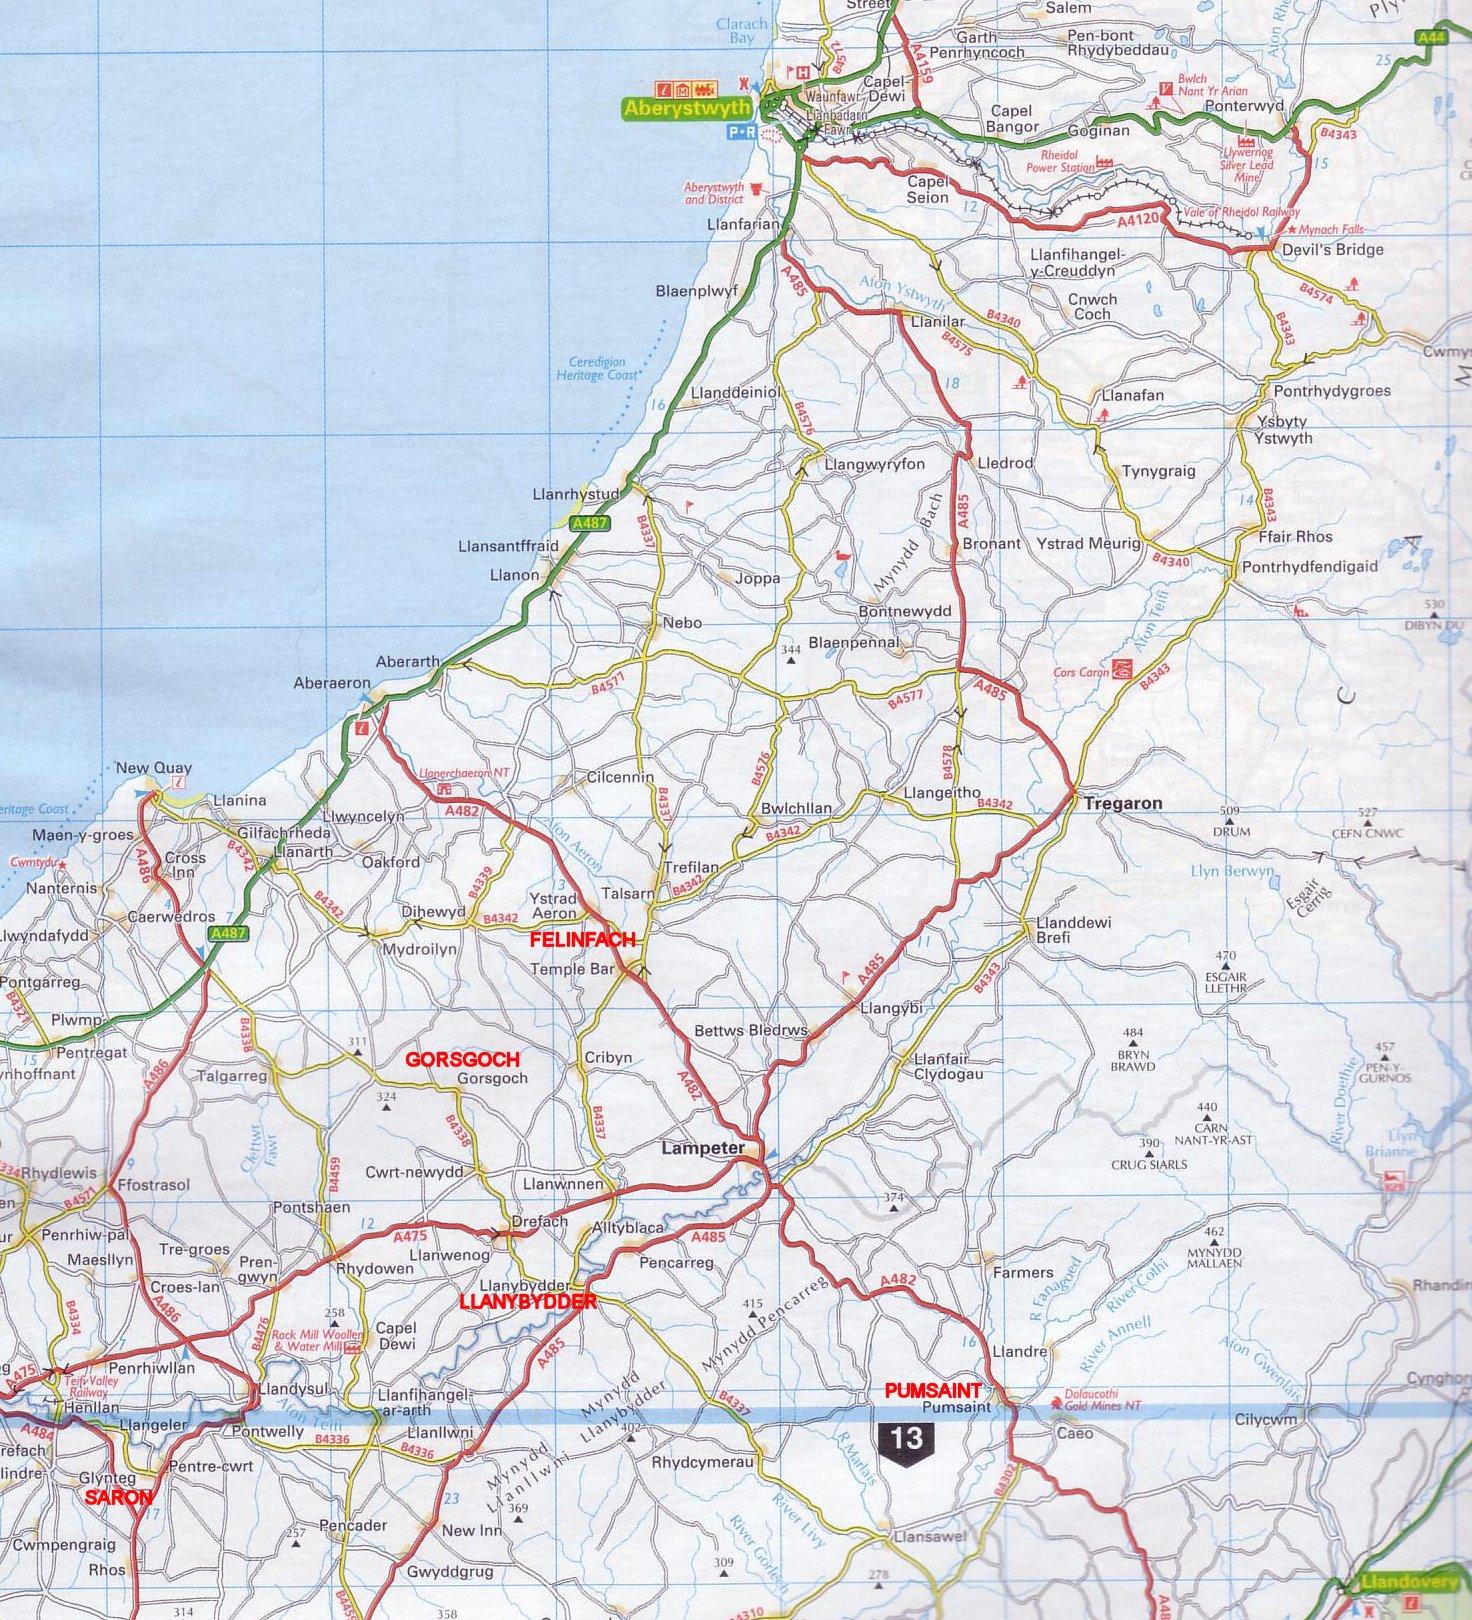 felinfach gorsgoch llanybydder pumsaint saron map reproduced from the 2008 aa road